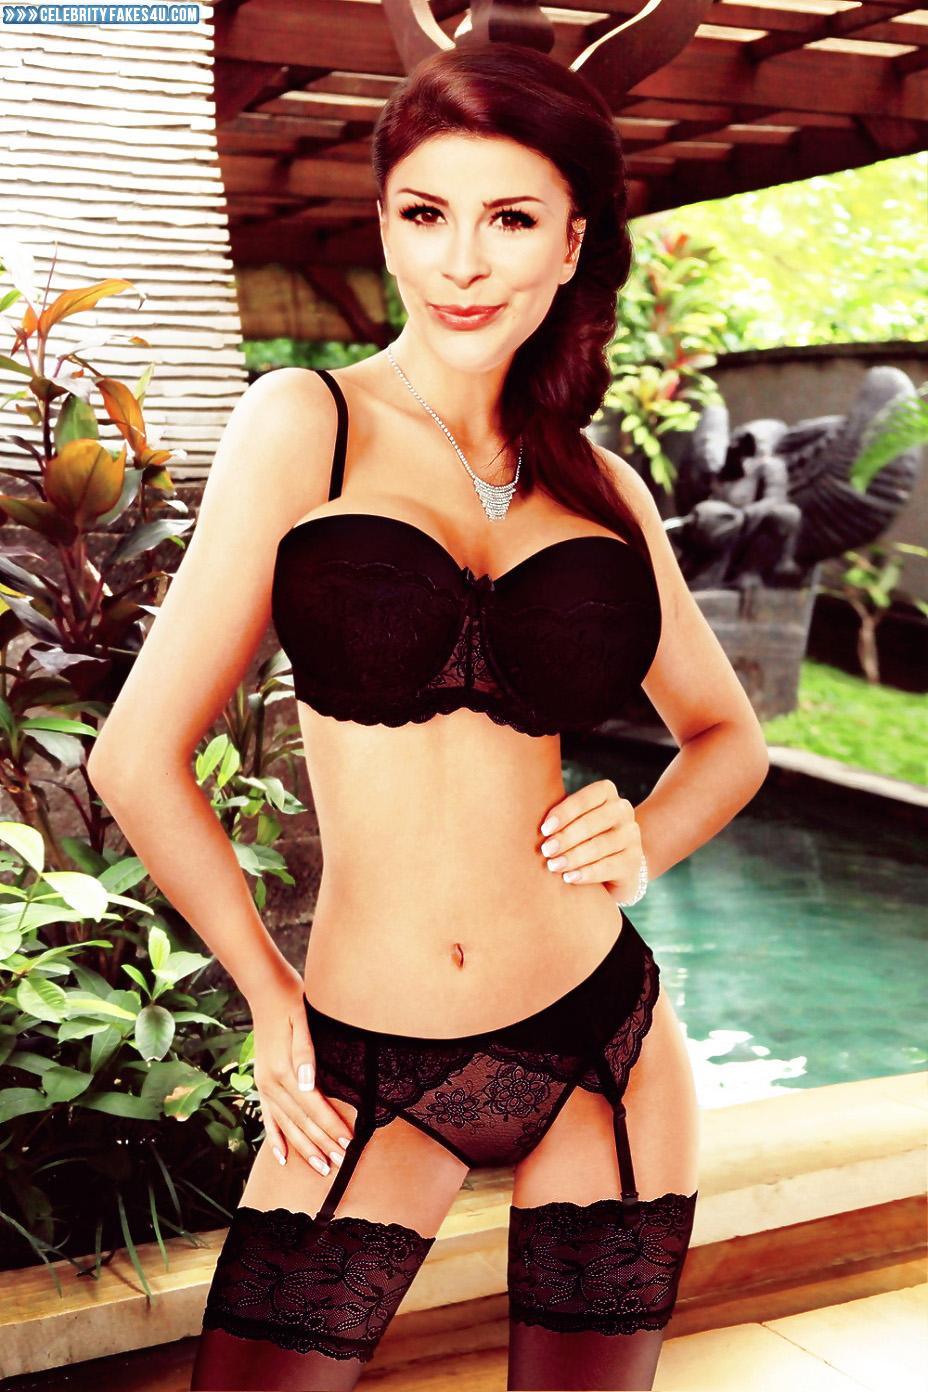 Lena Meyer Landrut Sexy Lingerie Nude - Fake 006